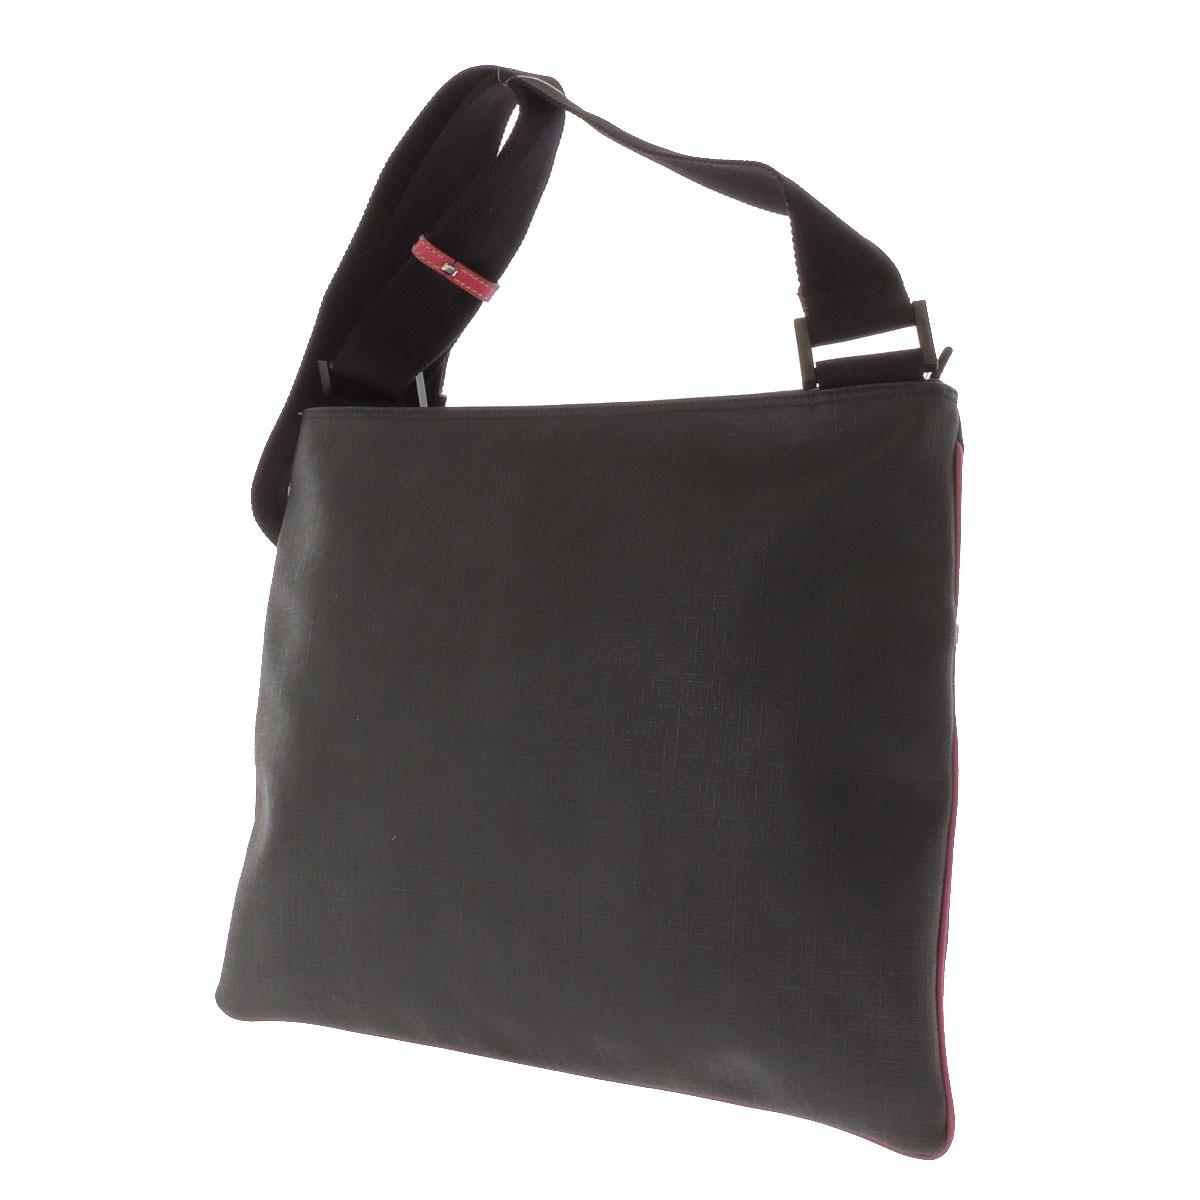 GUCCI logo shoulder bag PVC ladies